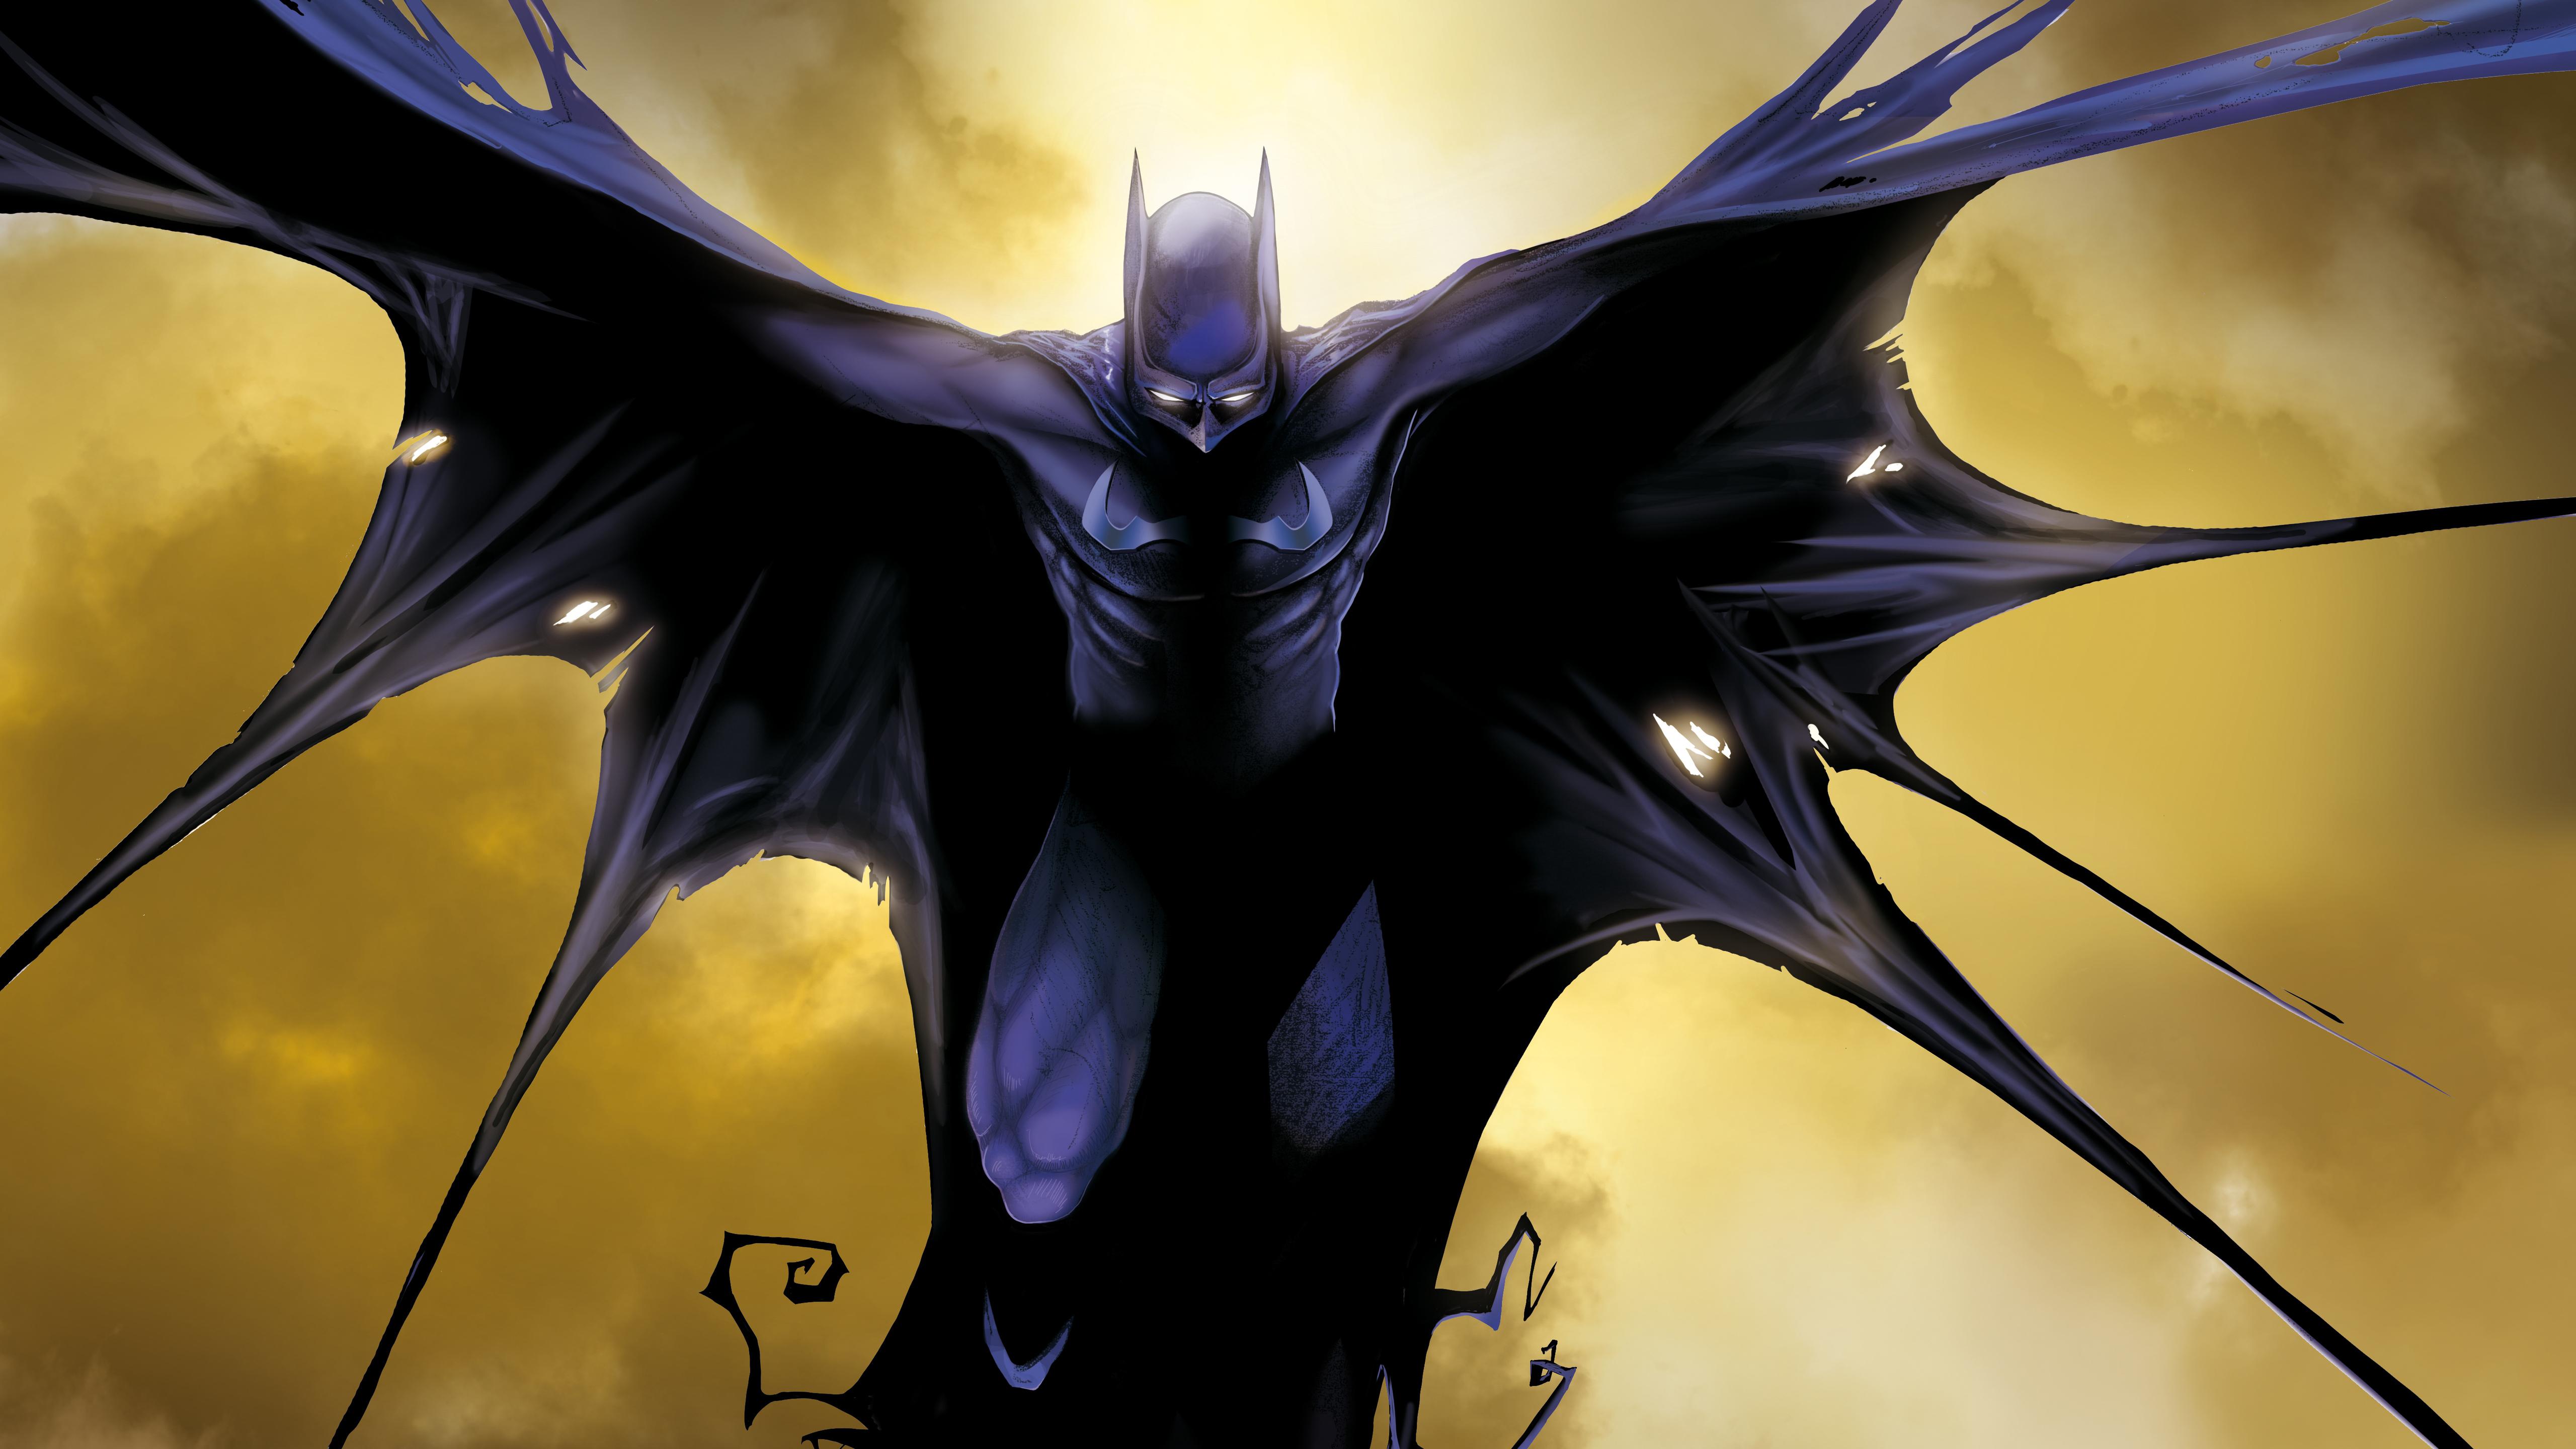 batman-the-dark-creature-5k-1g.jpg